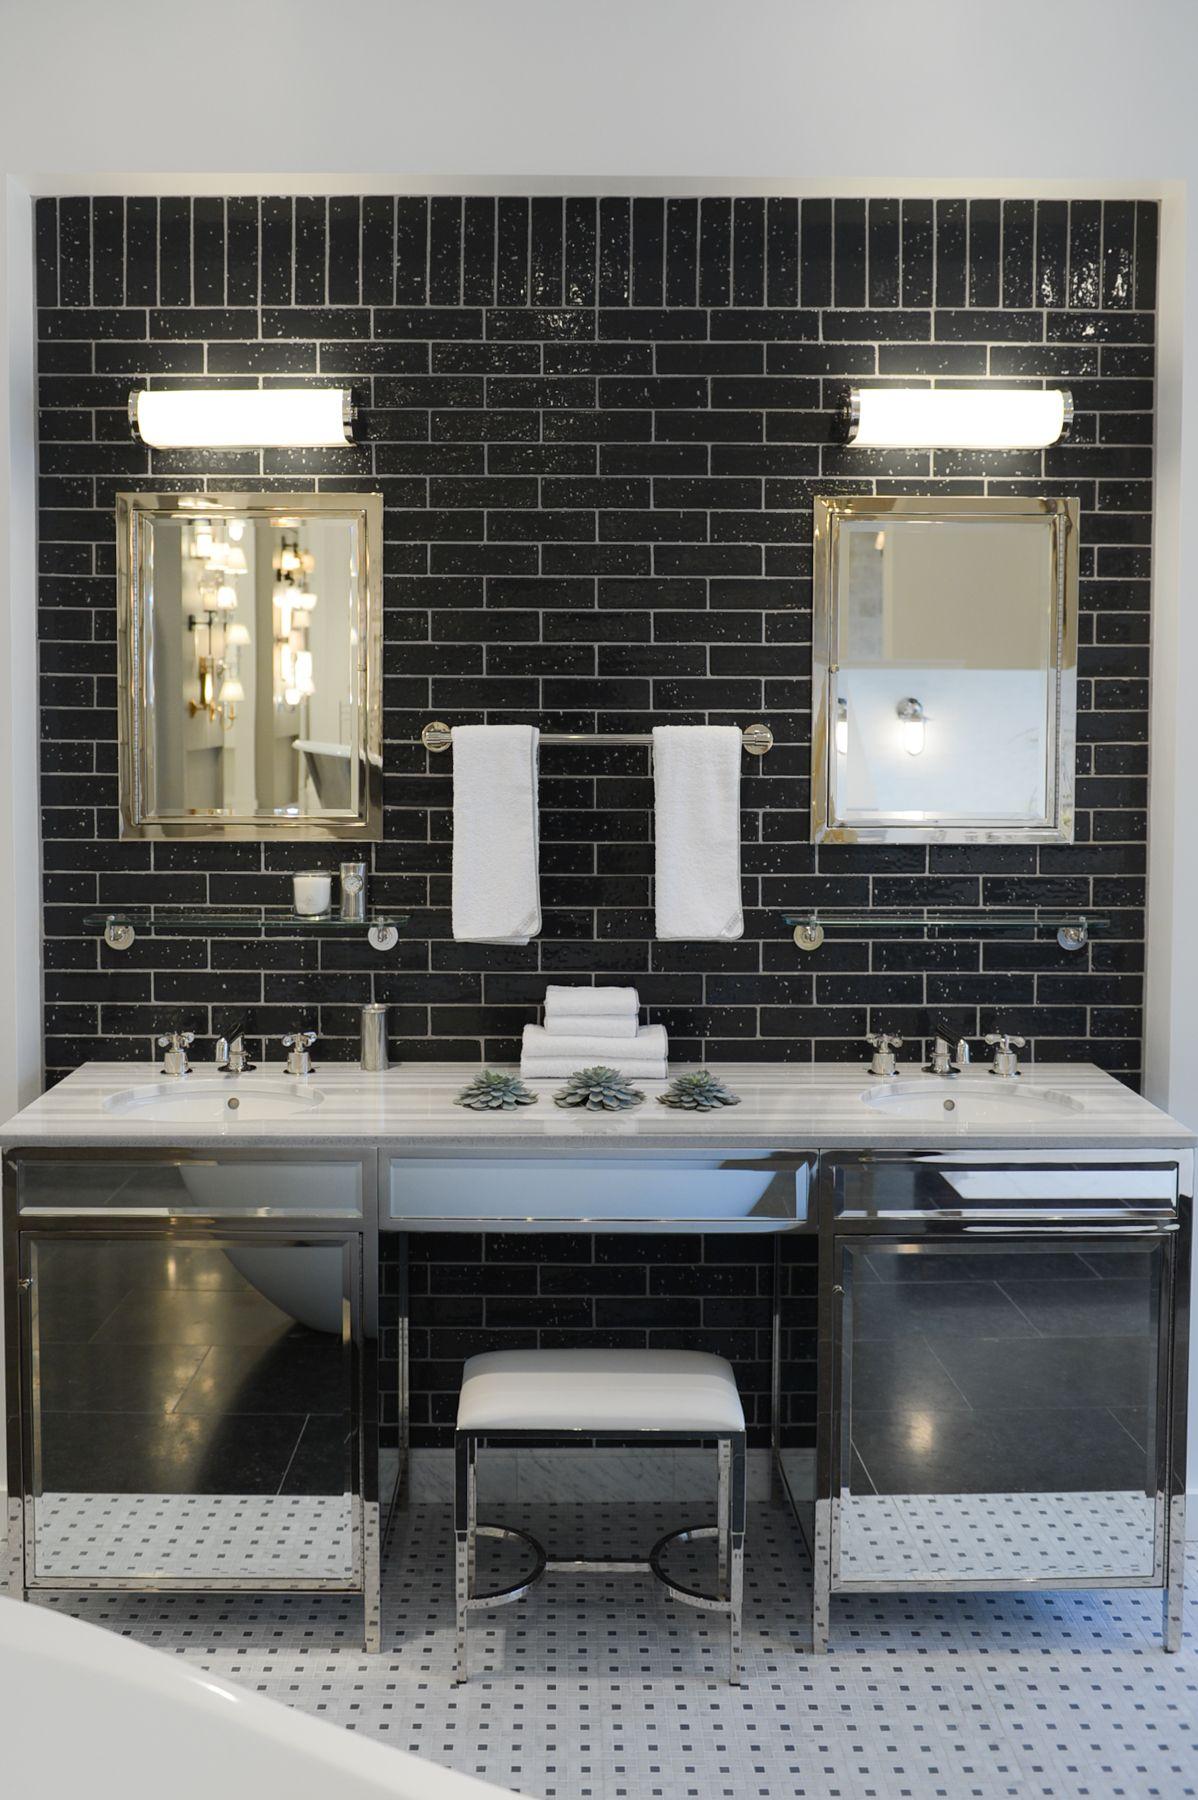 waterworks henry grove brickworks | 11th Avenue Client | Pinterest ...